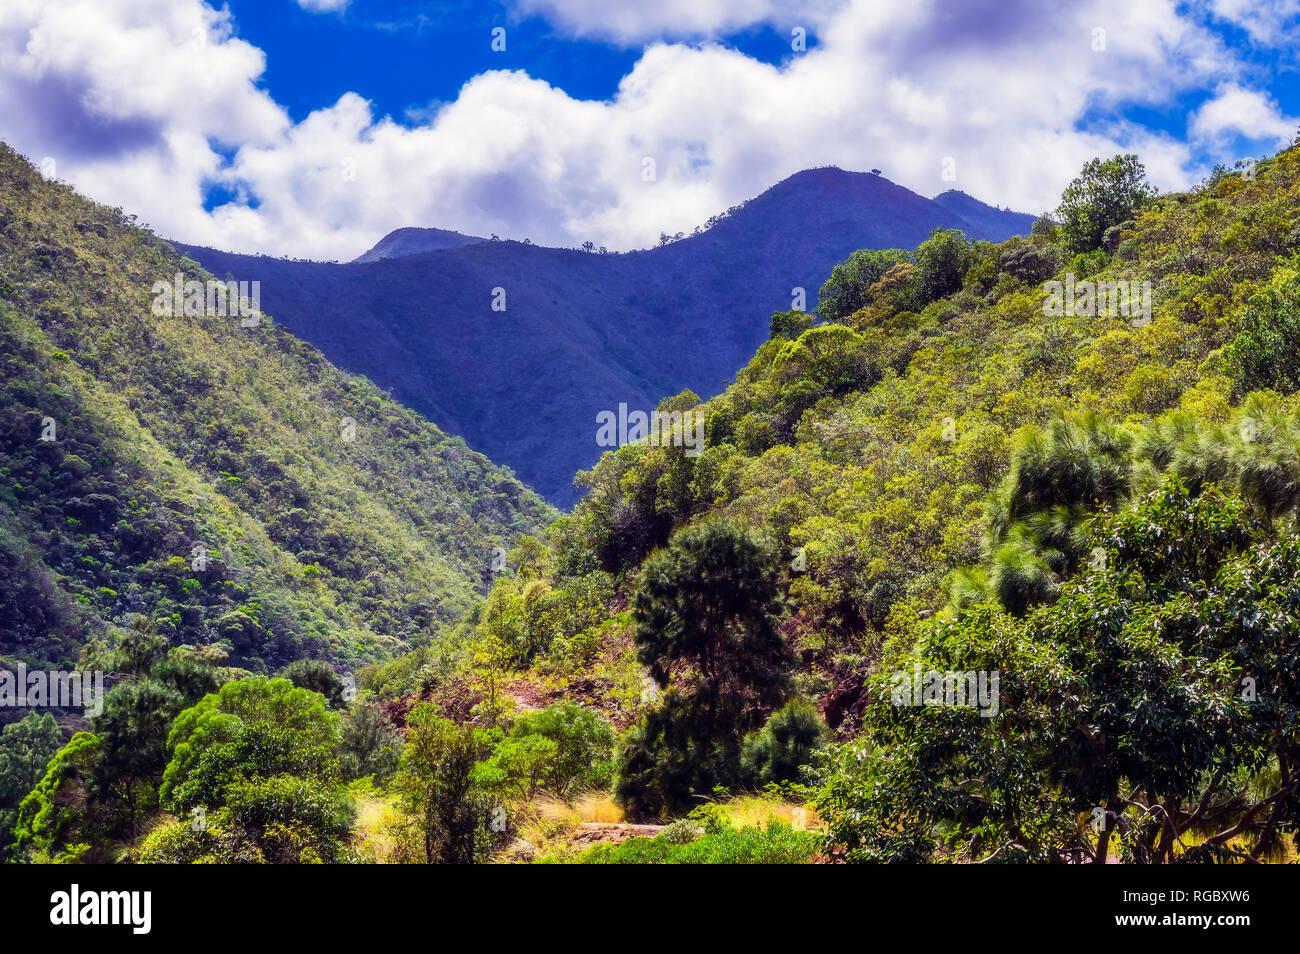 New Caledonia, Noumea, mountains - Stock Image